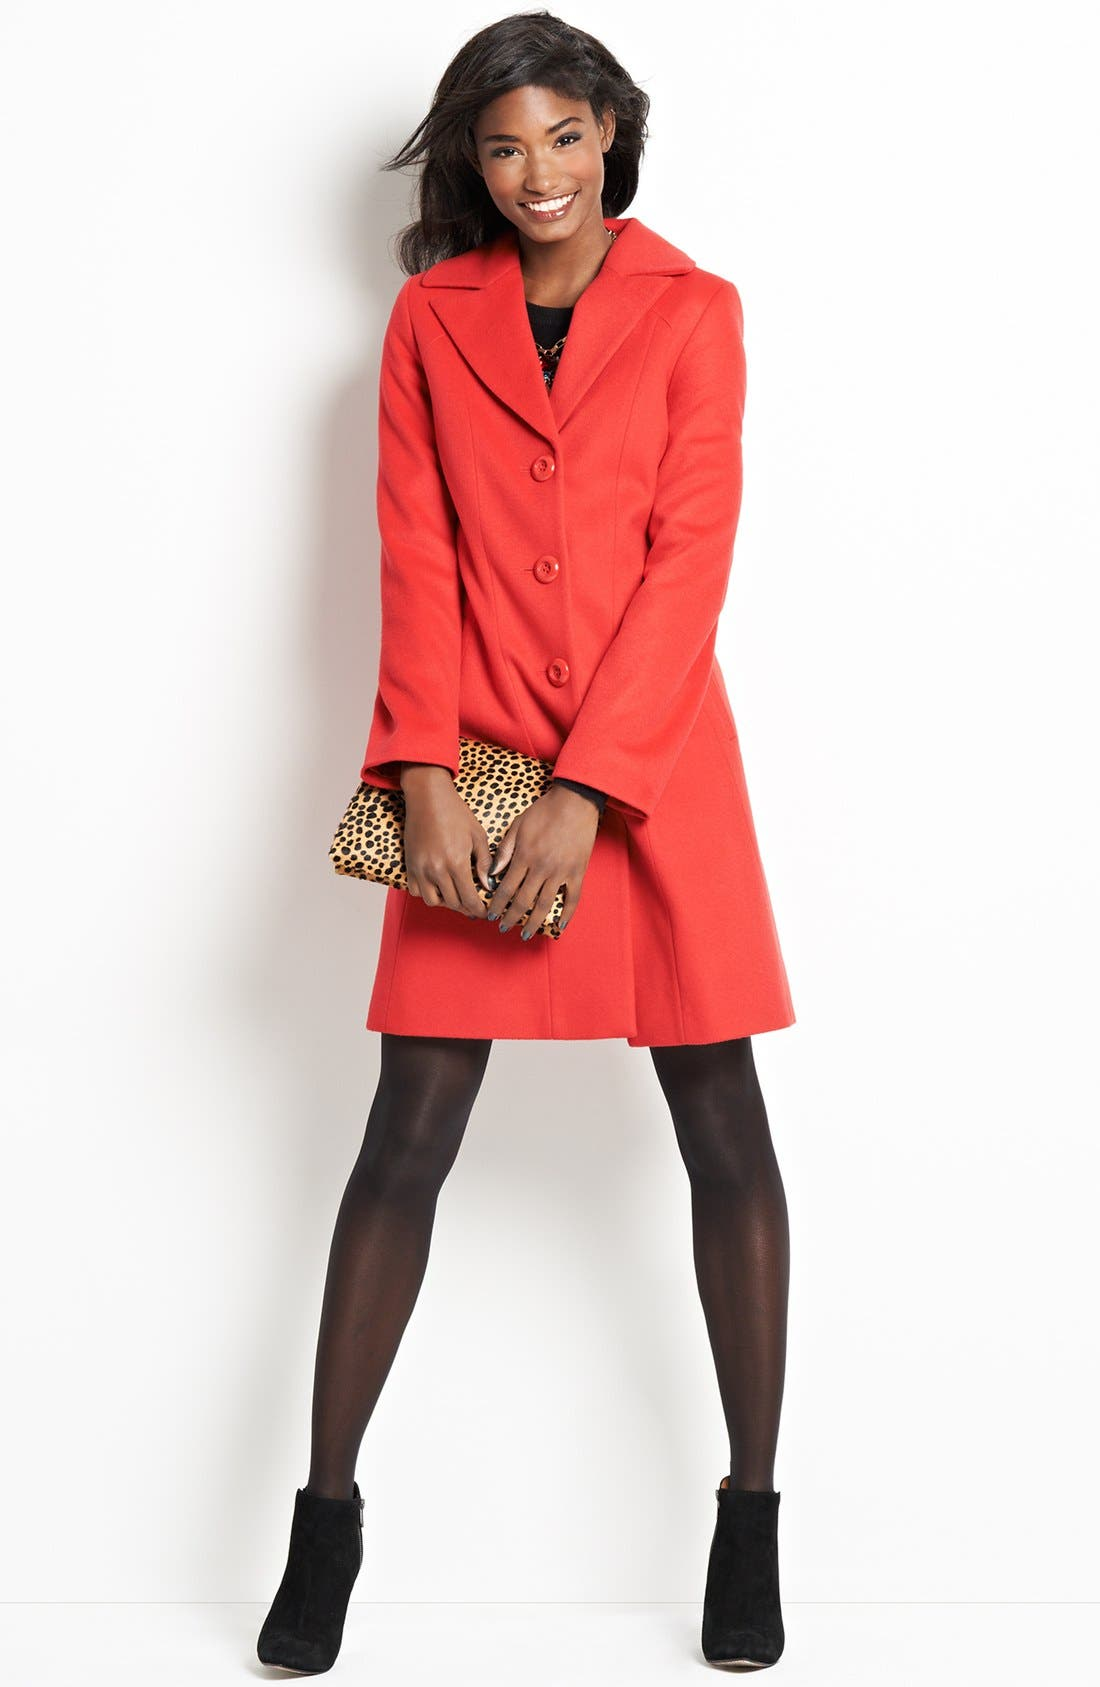 Alternate Image 1 Selected - Kristen Blake Single Breasted Lambswool Blend Coat (Regular & Petite) (Nordstrom Exclusive)